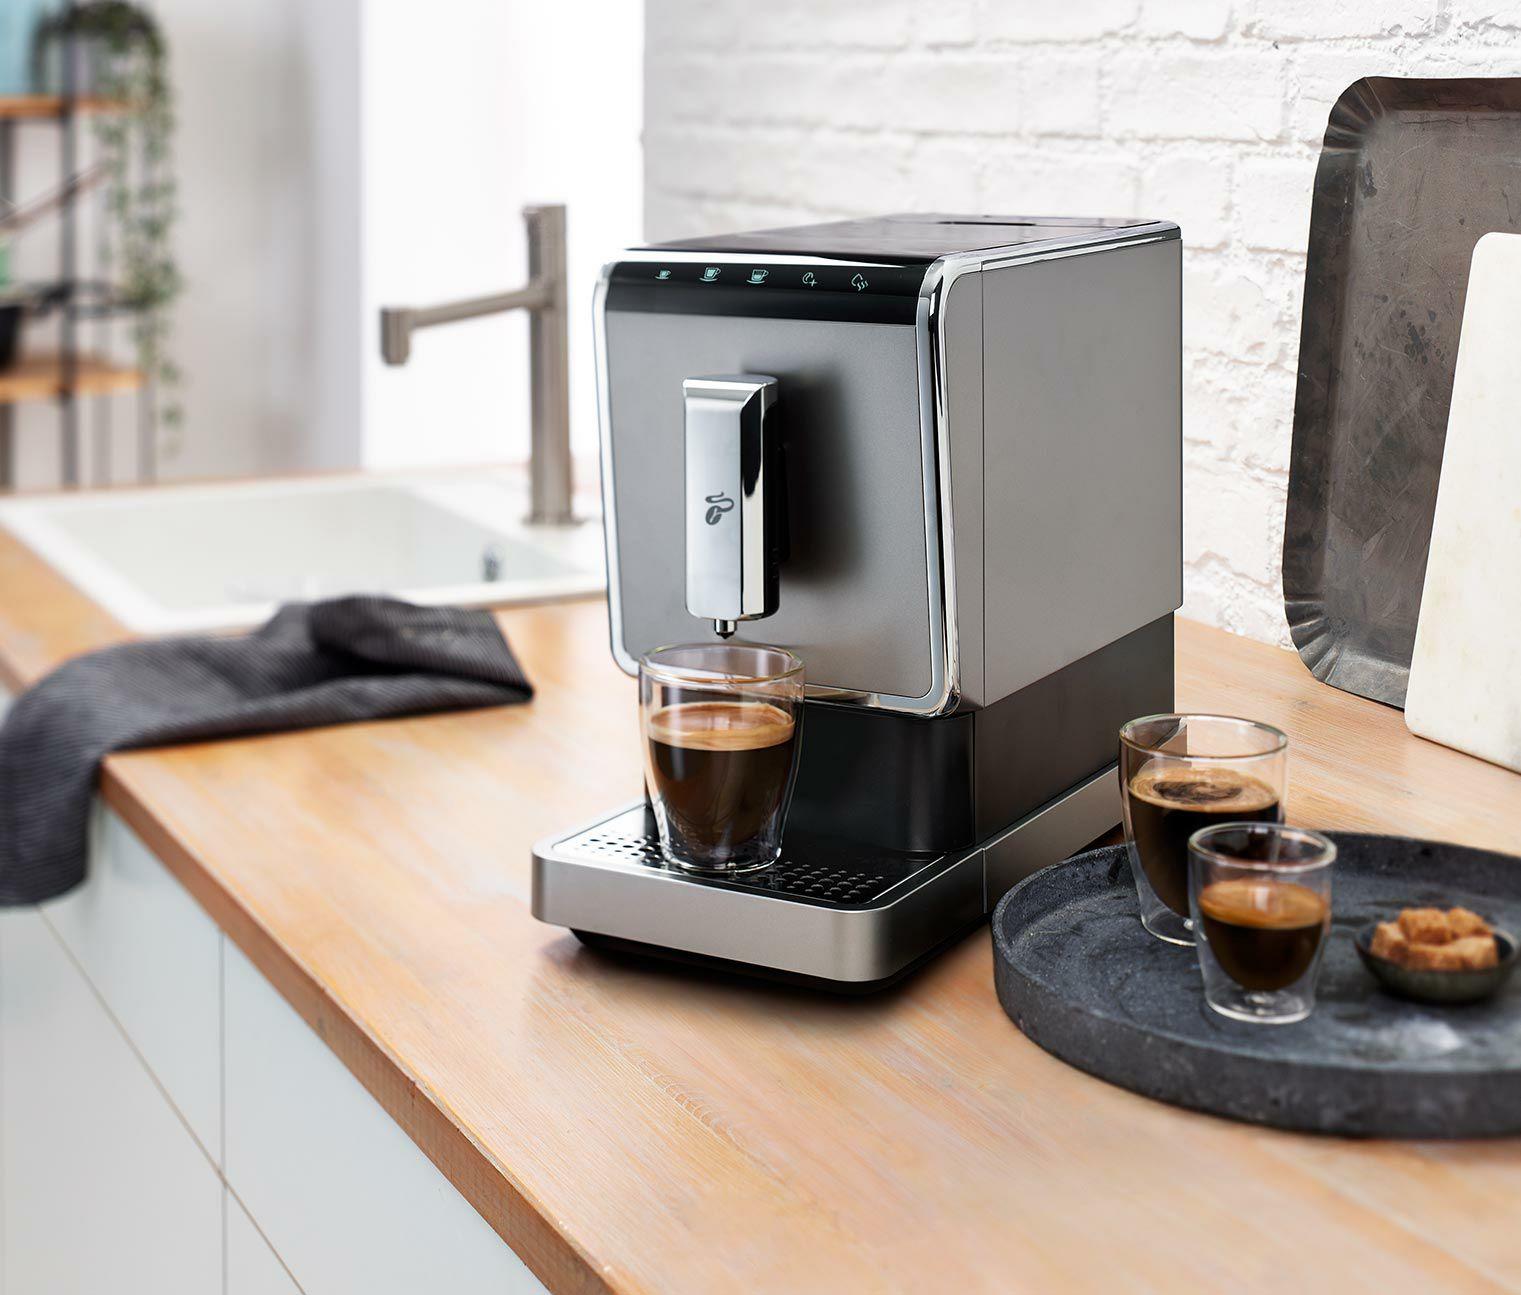 tchibo kaffevollautomat im angebot. Black Bedroom Furniture Sets. Home Design Ideas